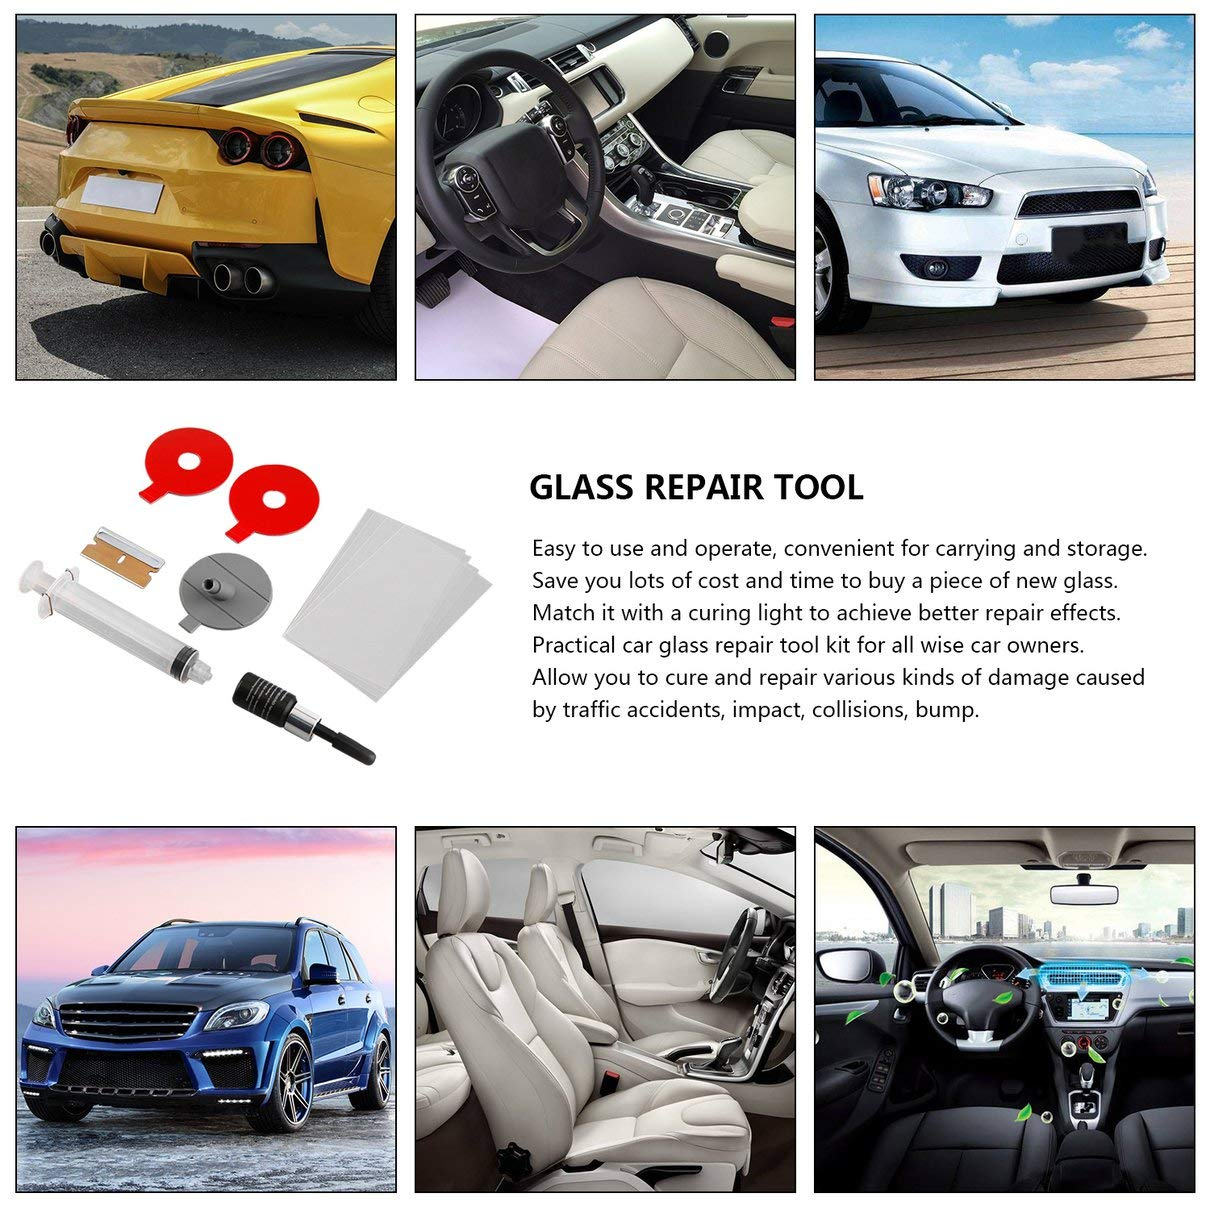 Car Windscreen Glass Repair Tools Auto Windshield Window Polishing Kit Chip Crack Star Bullseye DIY Set Car Accessories